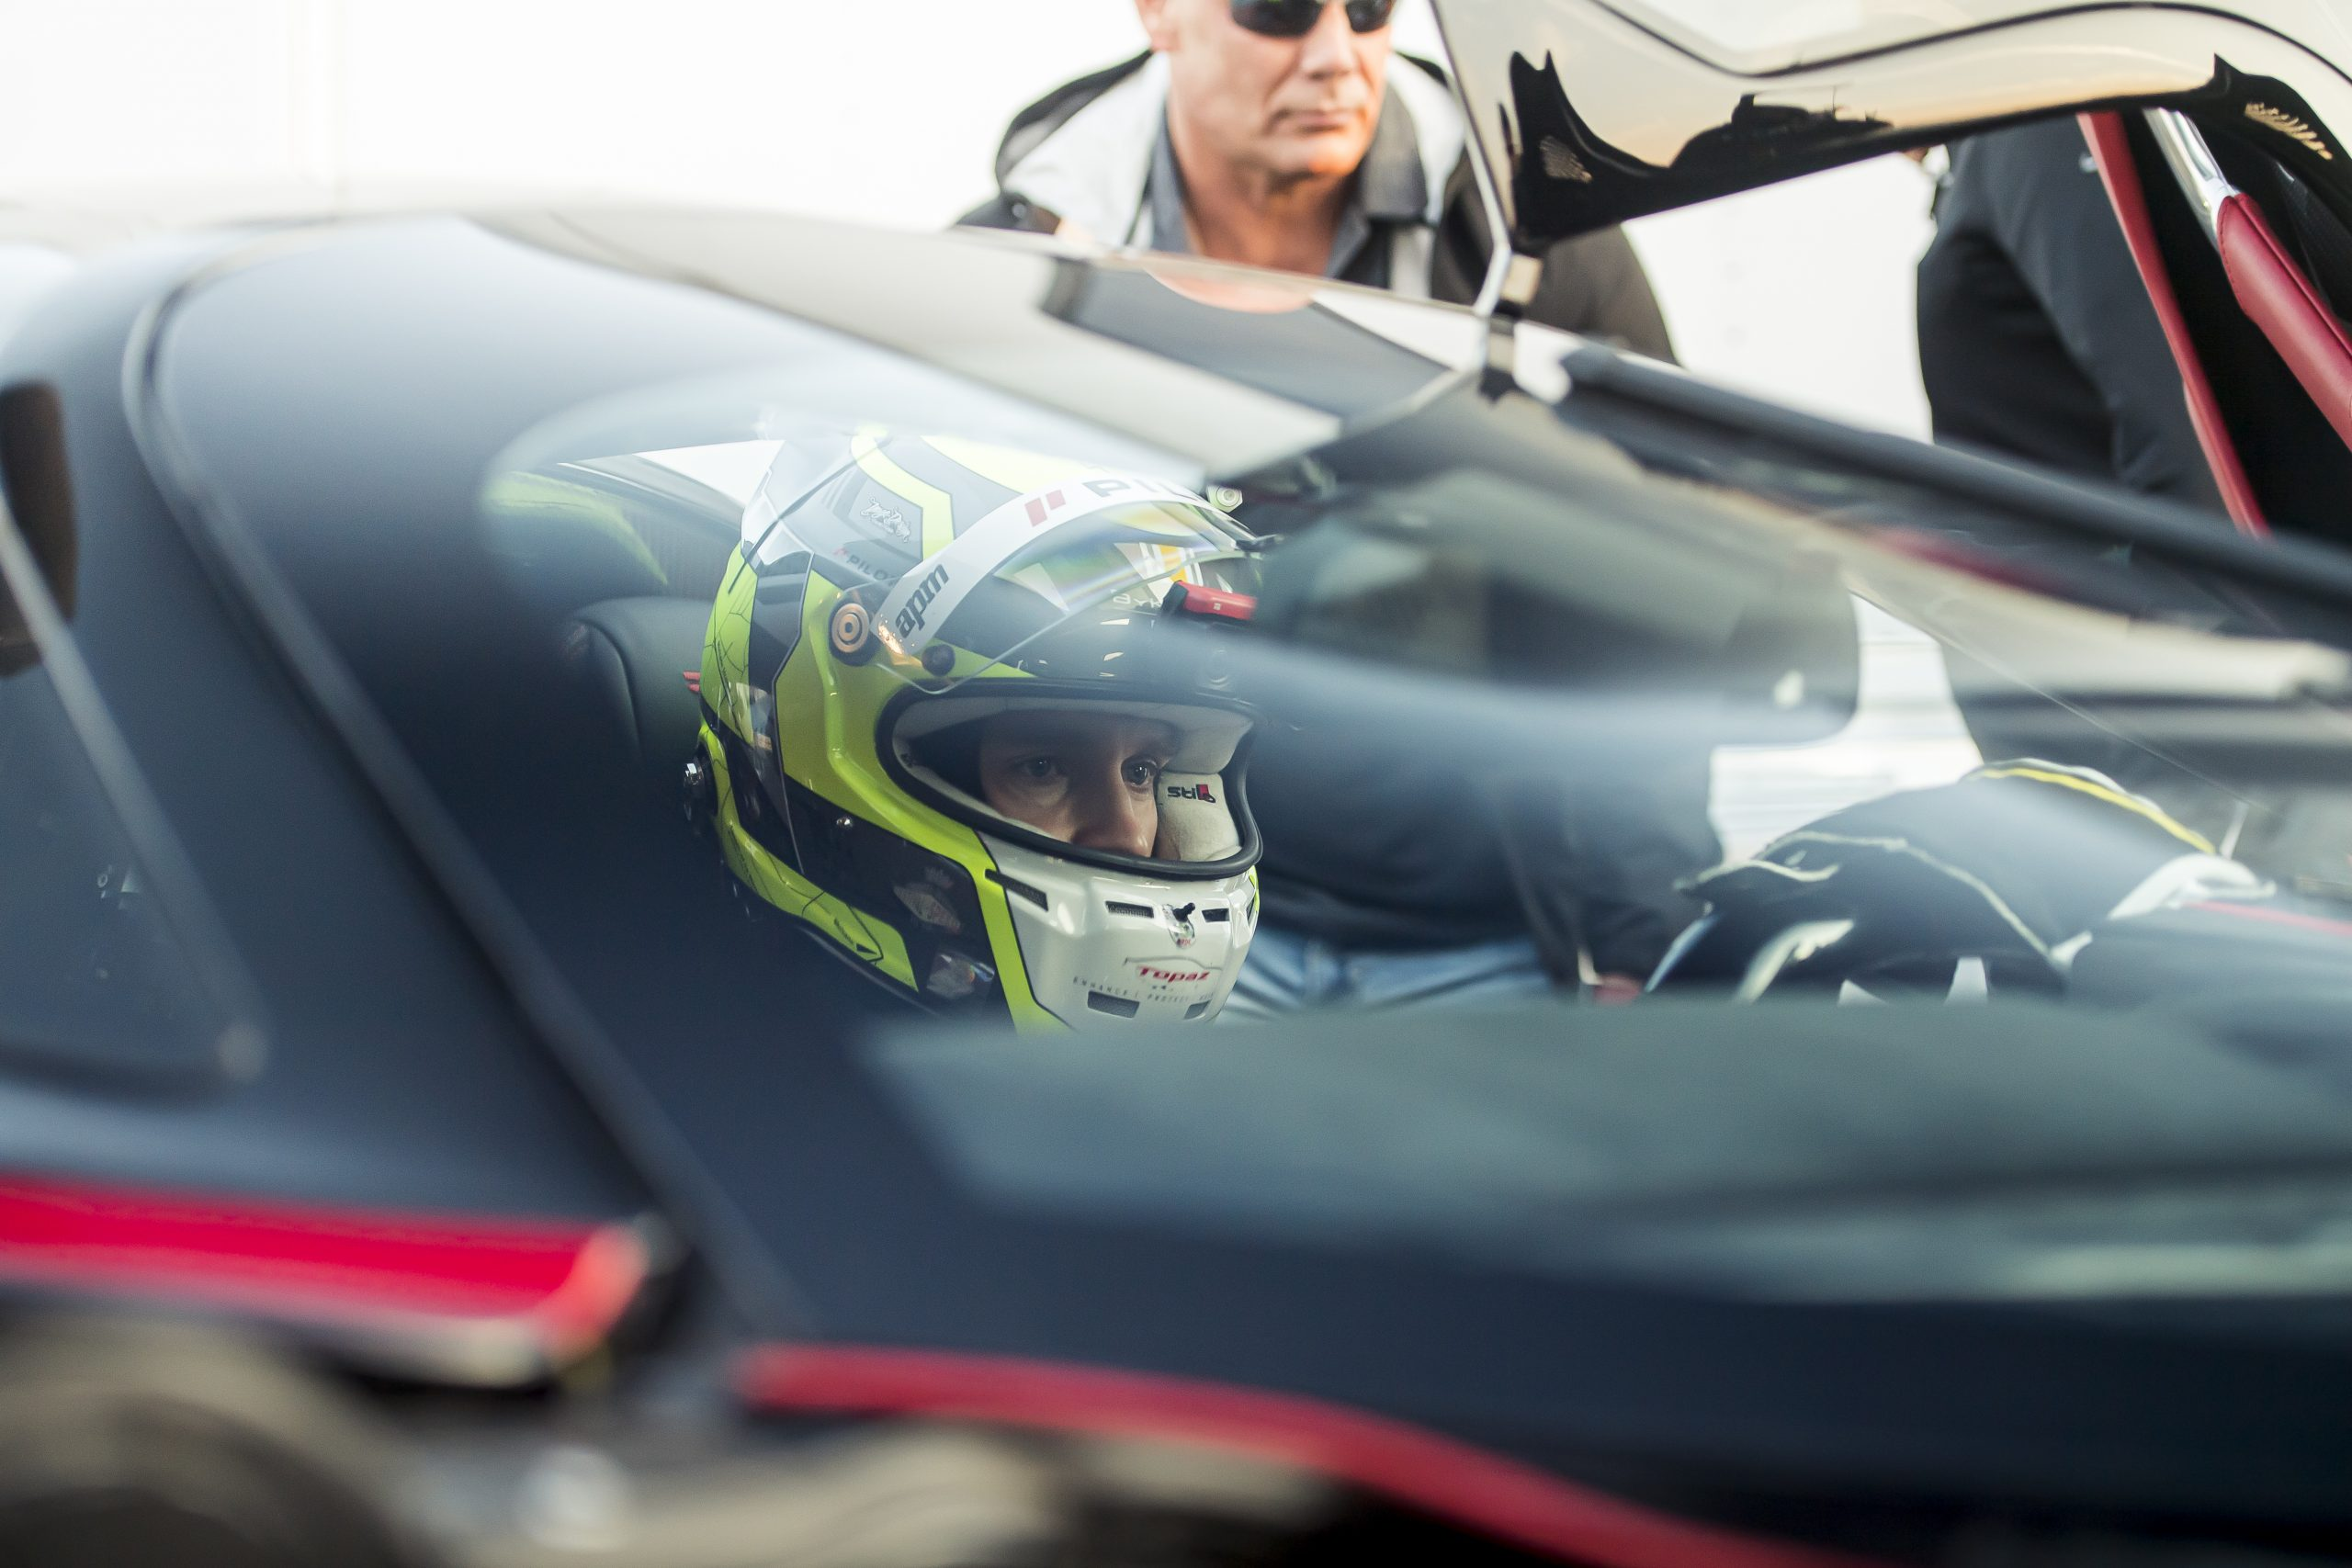 SSC Tuatara Production Car Speed Record driver behind wheel